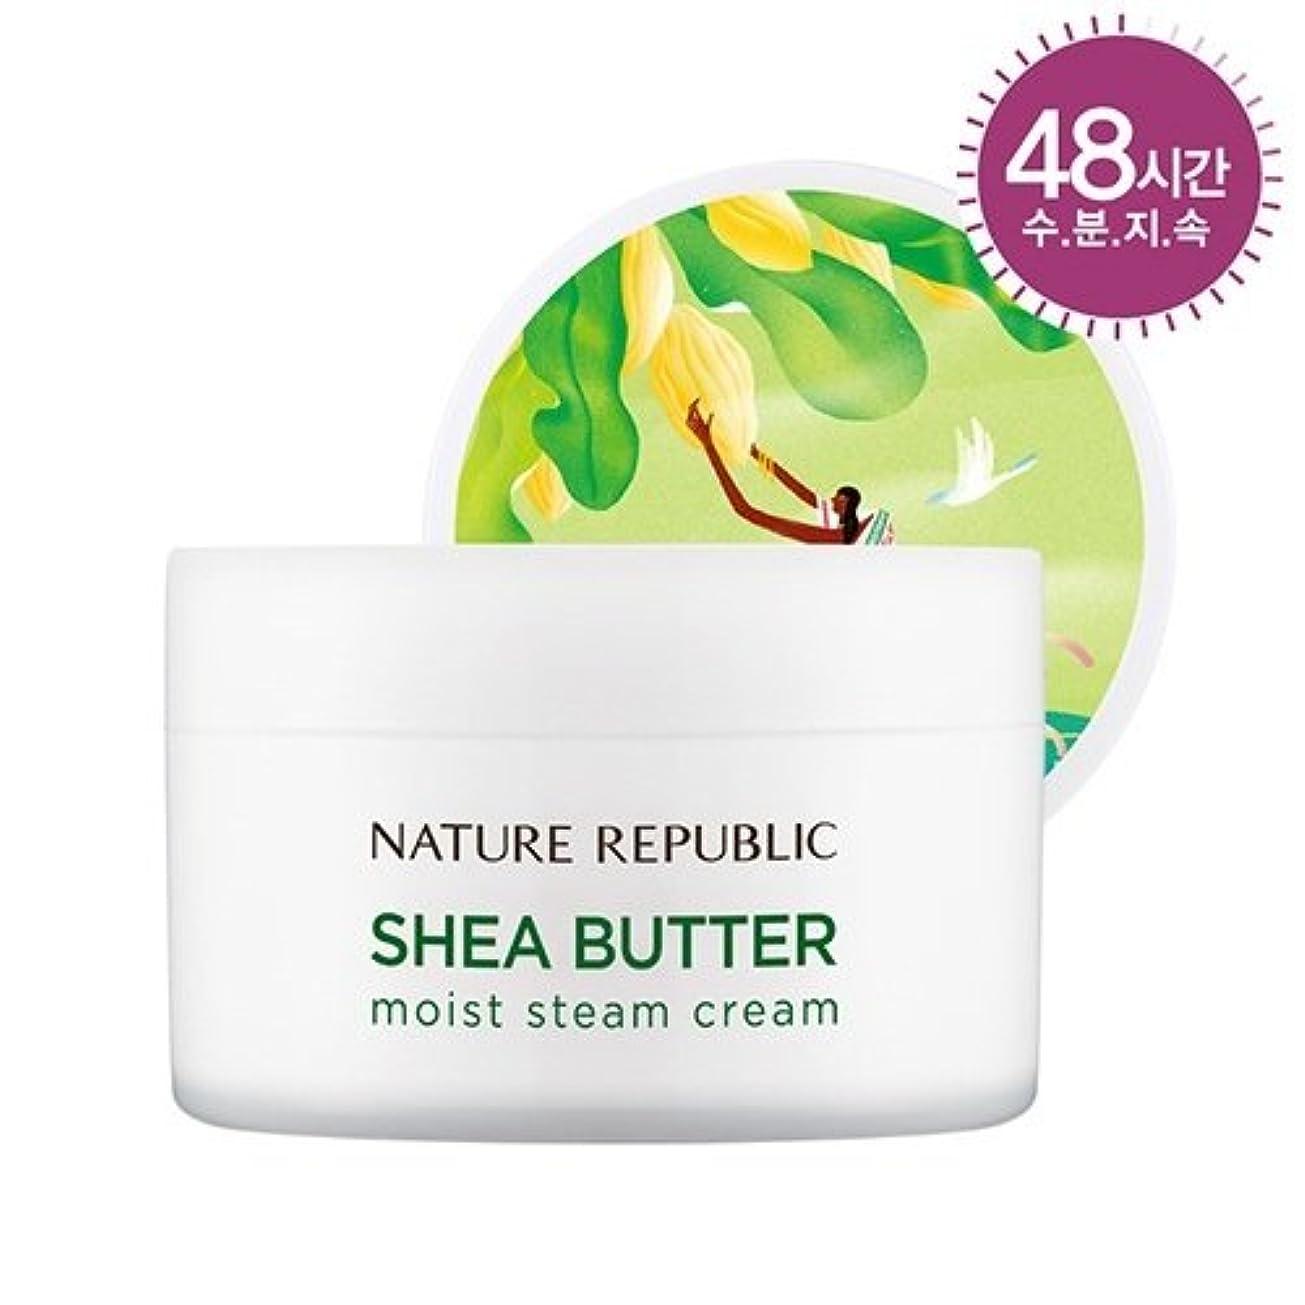 NATURE REPUBLIC(ネイチャーリパブリック) SHEA BUTTER STEAM CREAM シアバター スチーム クリーム #モイスト乾燥肌